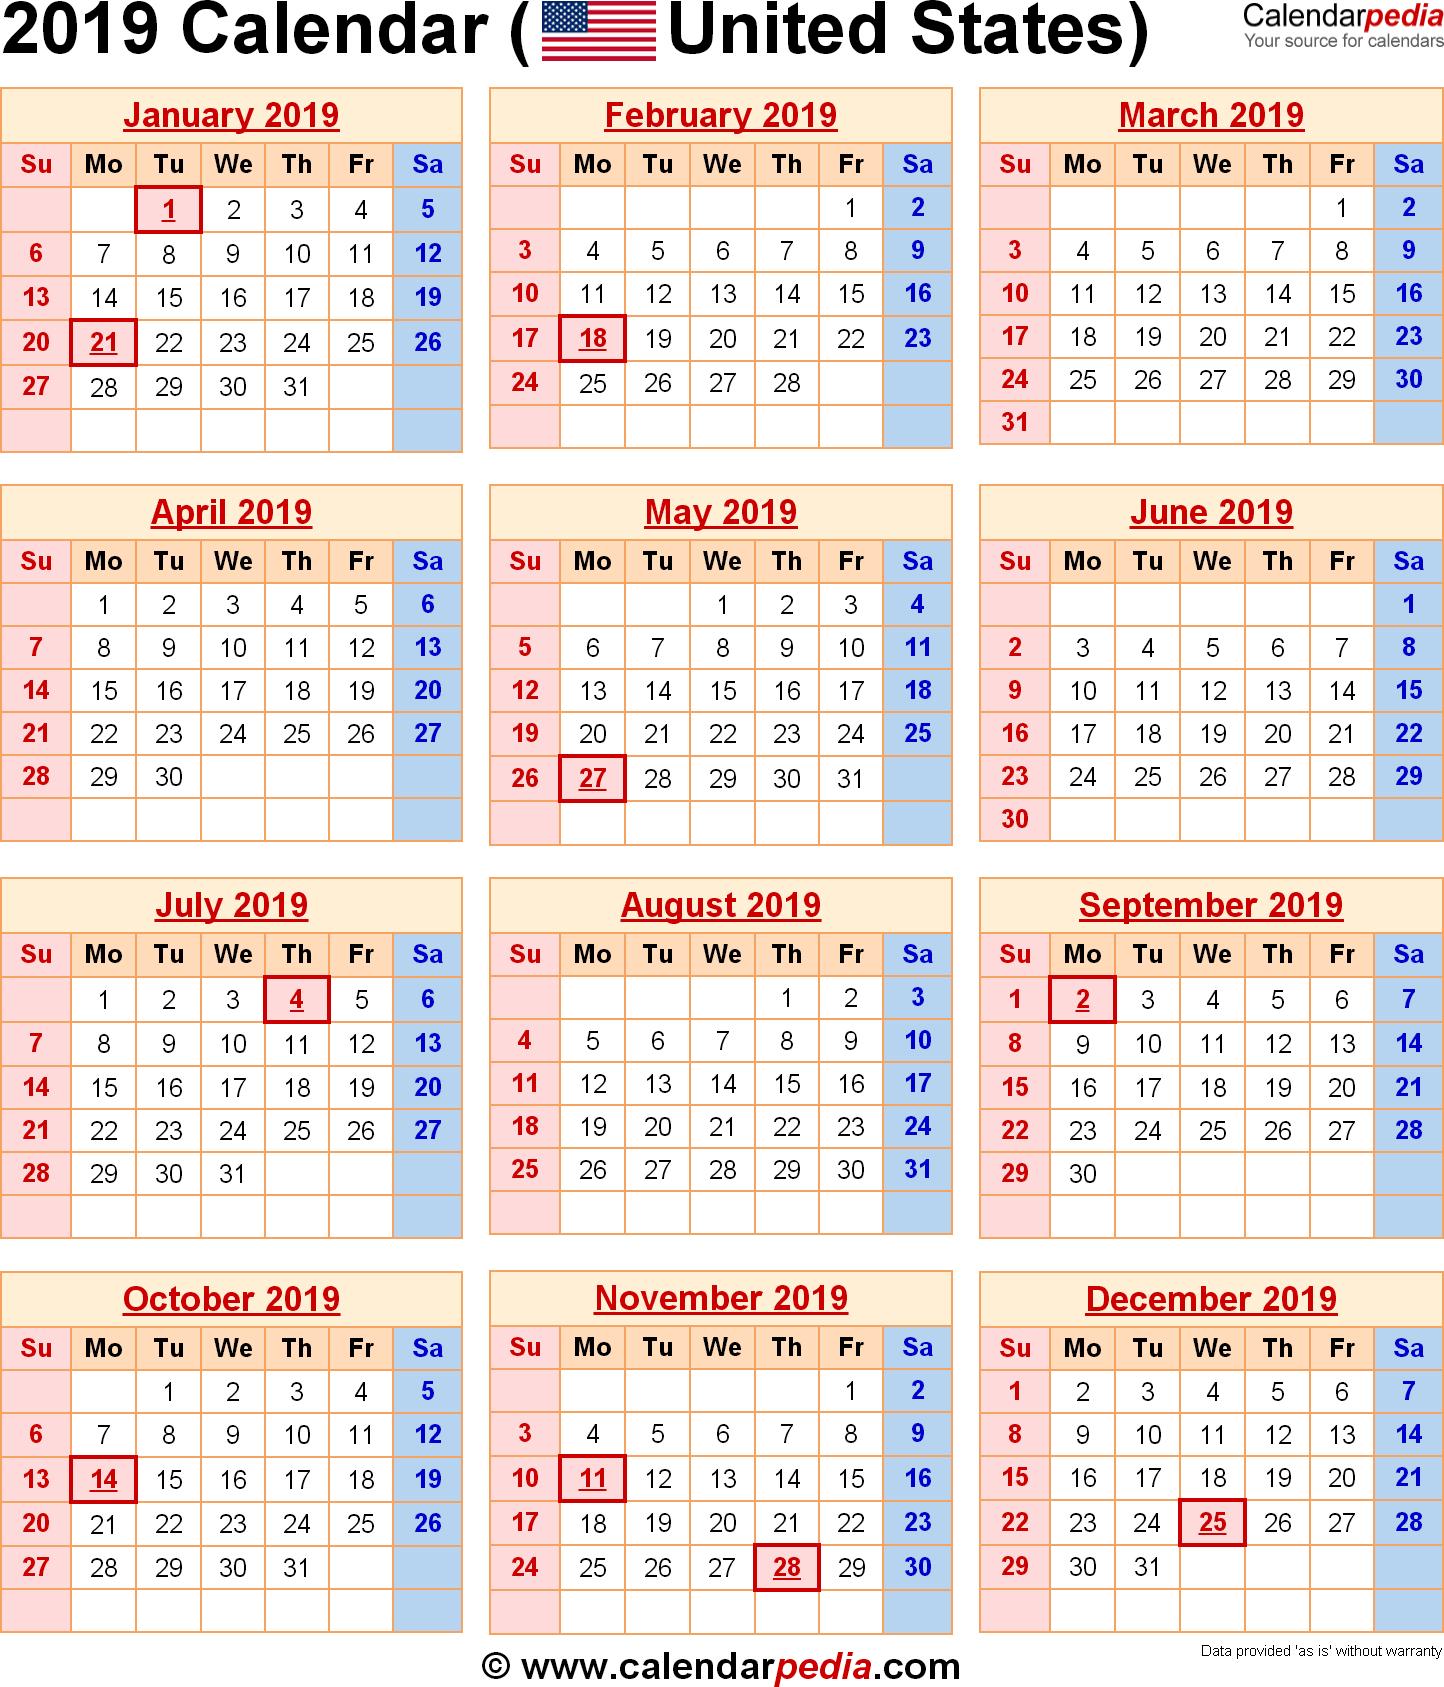 2019 Calendar United States | Us Federal Holidays | 2019 Calendar Us Calendar 2019 United States